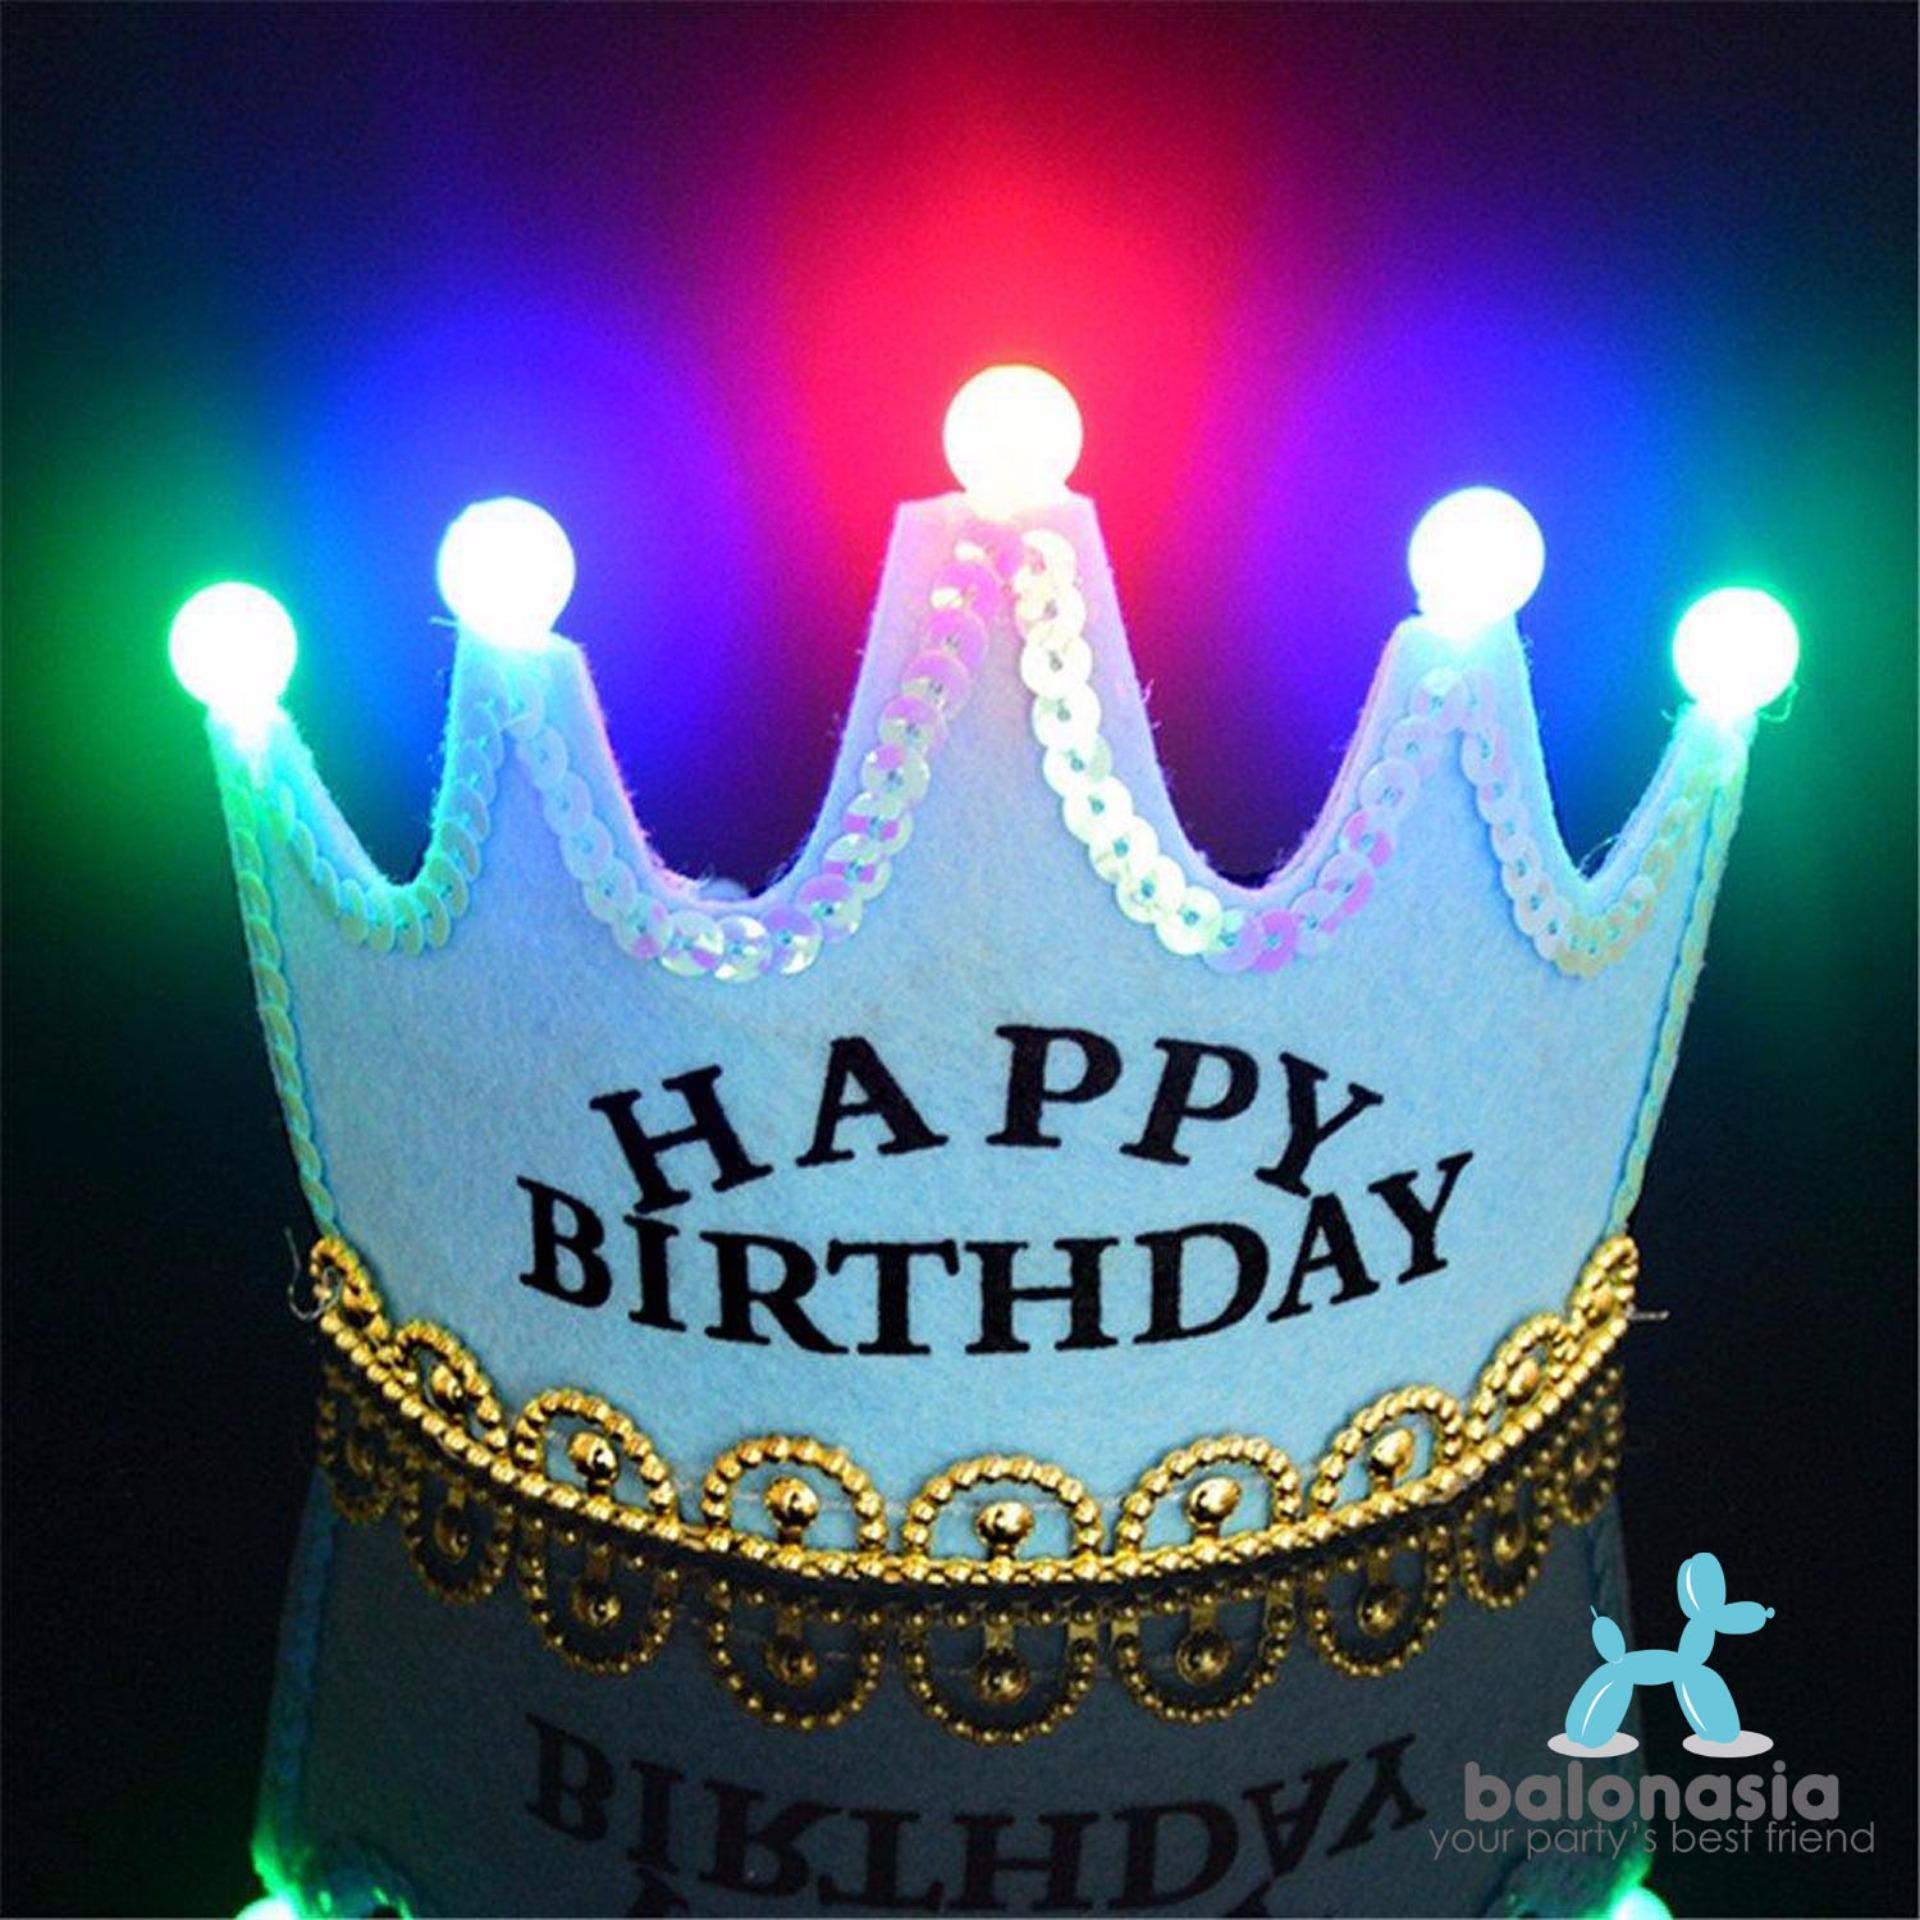 Balonasia 6 Pcs Lot Bunga Kertas Fan Tissue Kerajinan Dekorasi Backdrop Set Ulang Tahun Garis Polkadot Hot Deals Crown Led Happy Birthday Biru Untuk Pesta Terbaik Murah Hanya